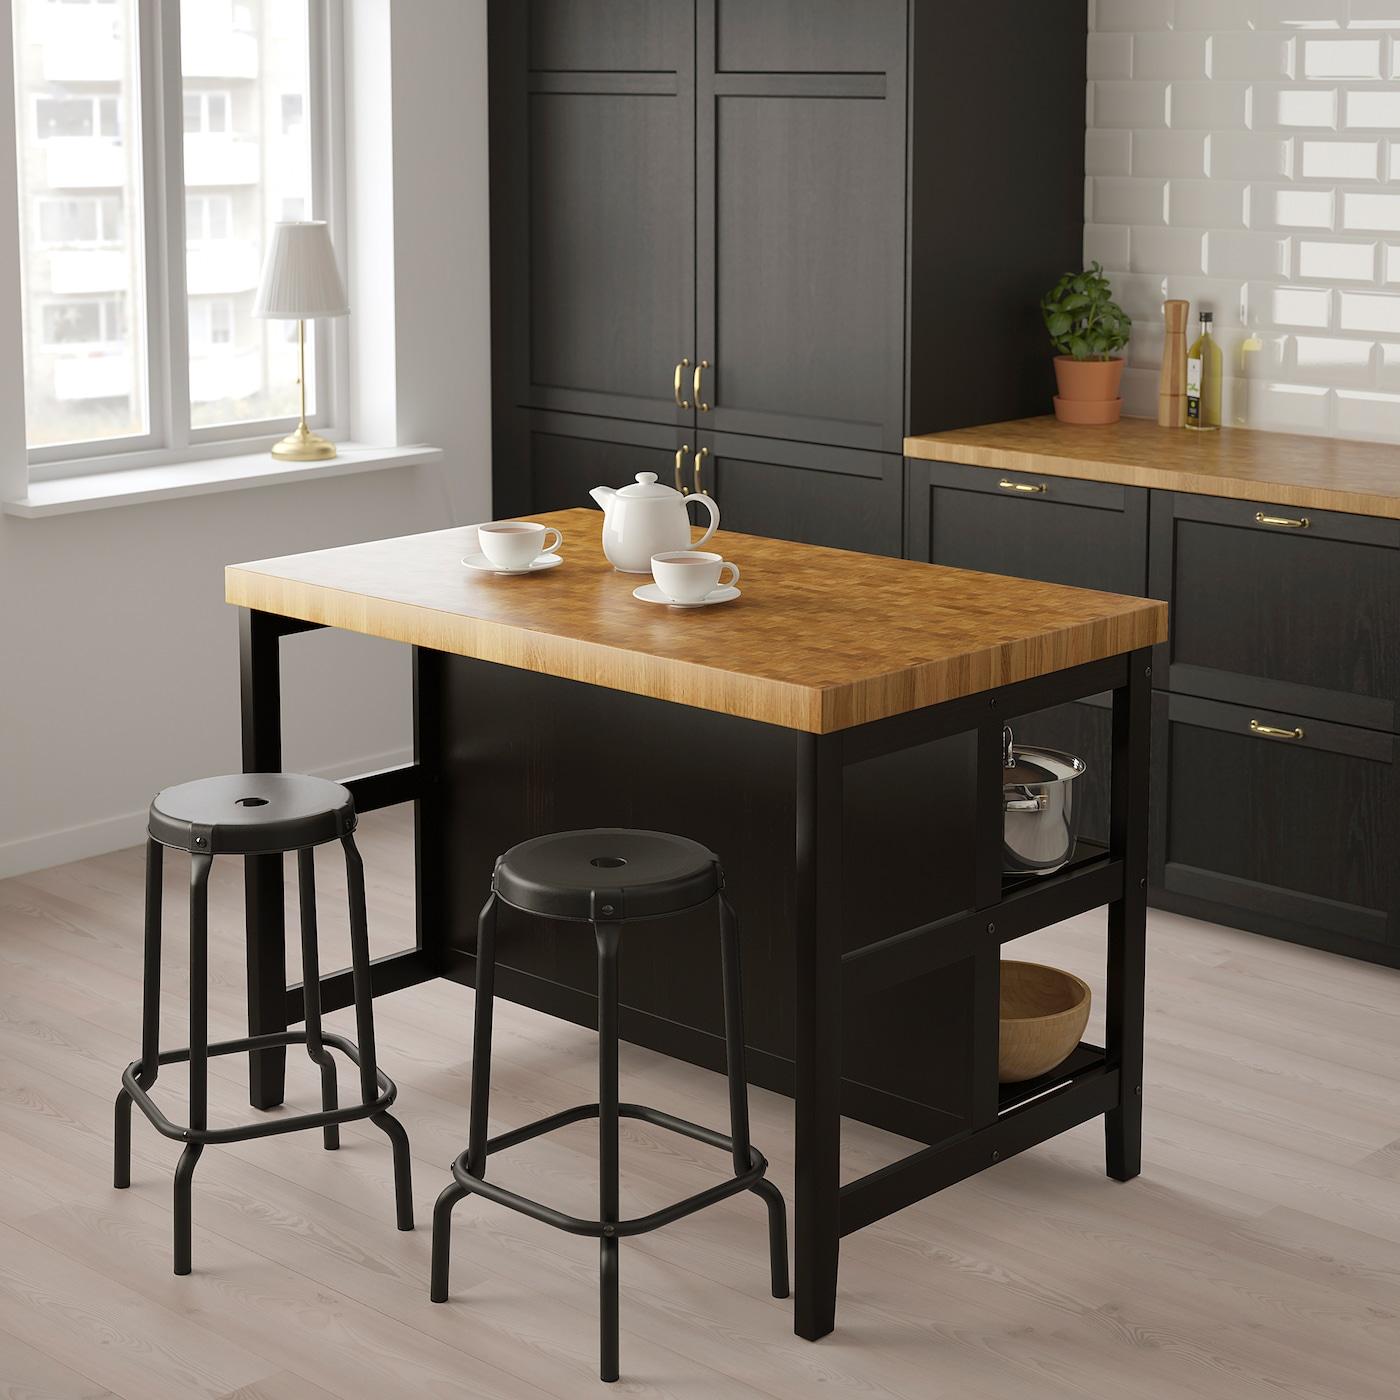 VADHOLMA Kücheninsel, schwarz/Eiche, 126x79x90 cm